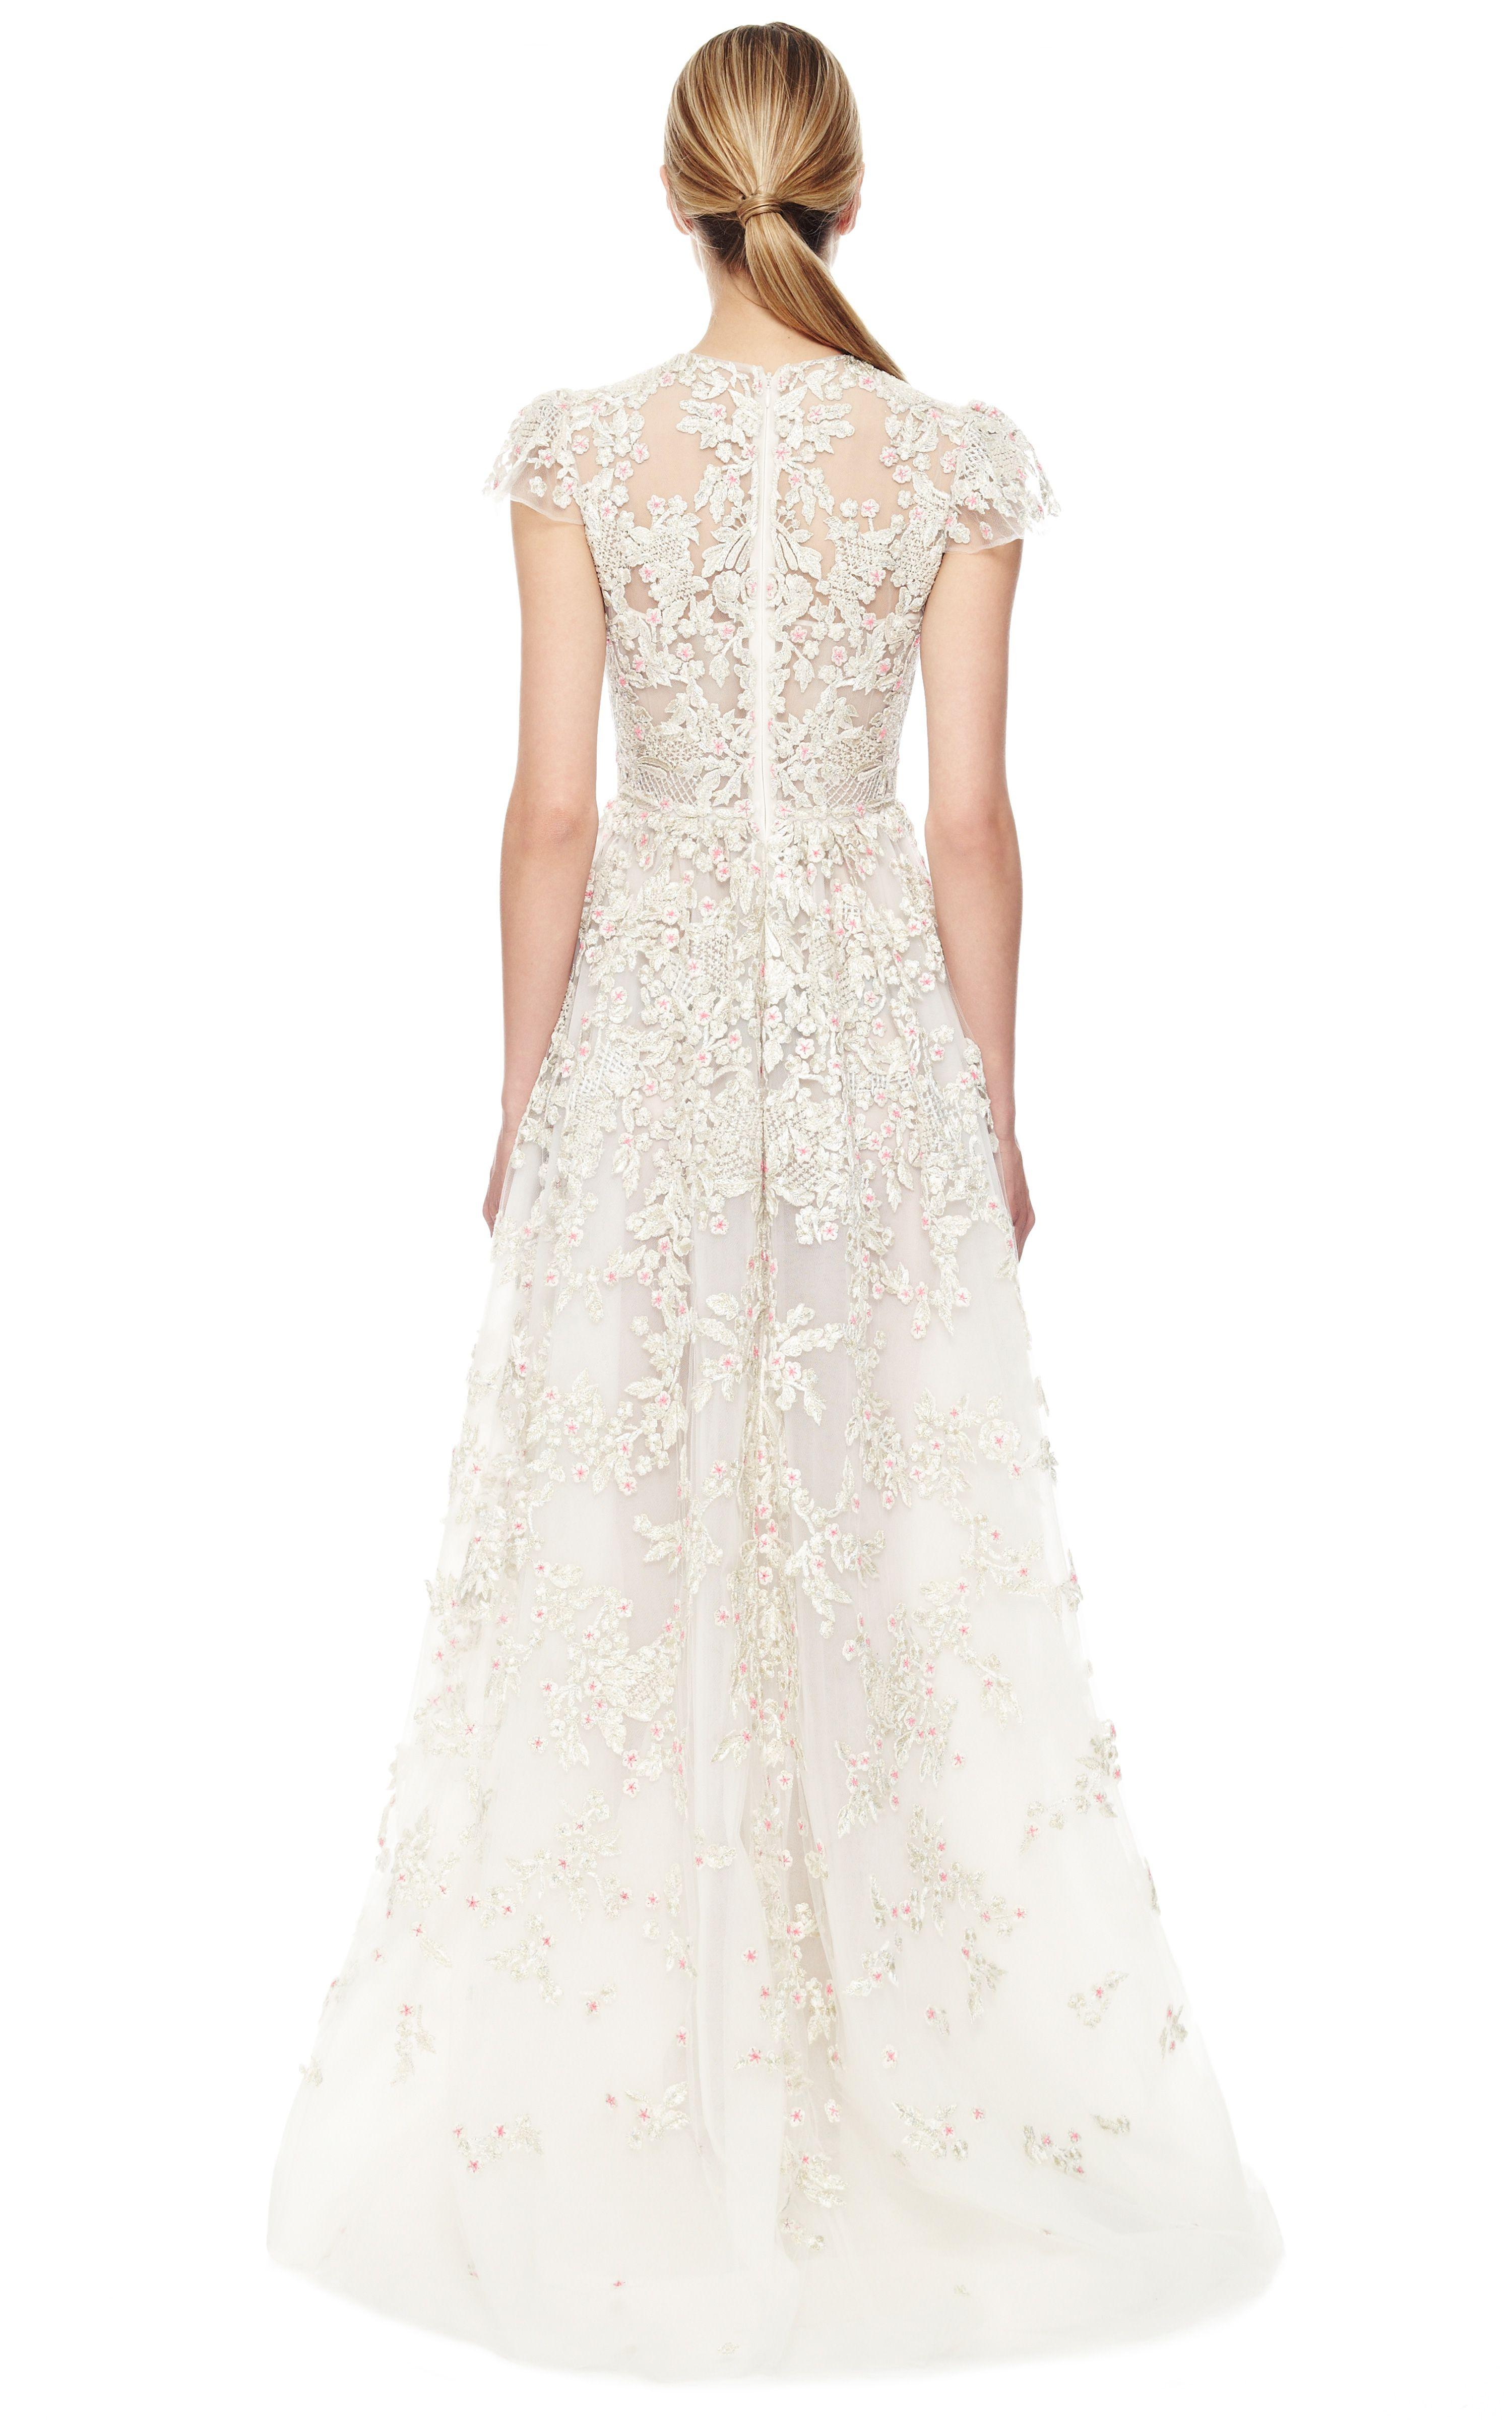 Valentino wedding dress  Embellished Chiffon Gown by Valentino  Moda Operandi  HEARTOFGOLD